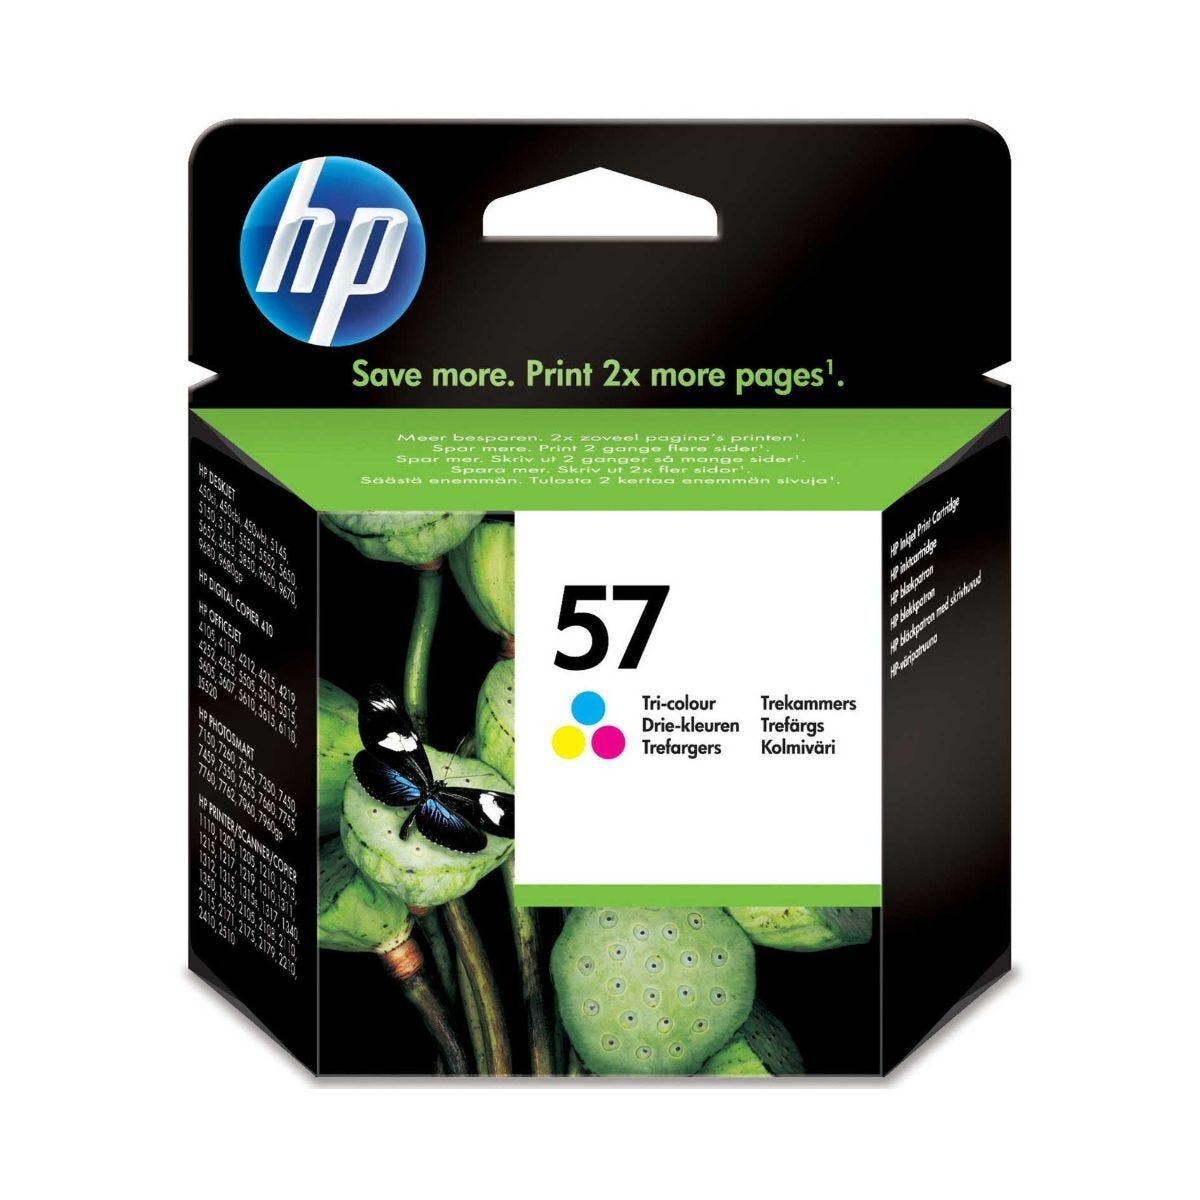 HP 57 Ink Cartridge 17ml